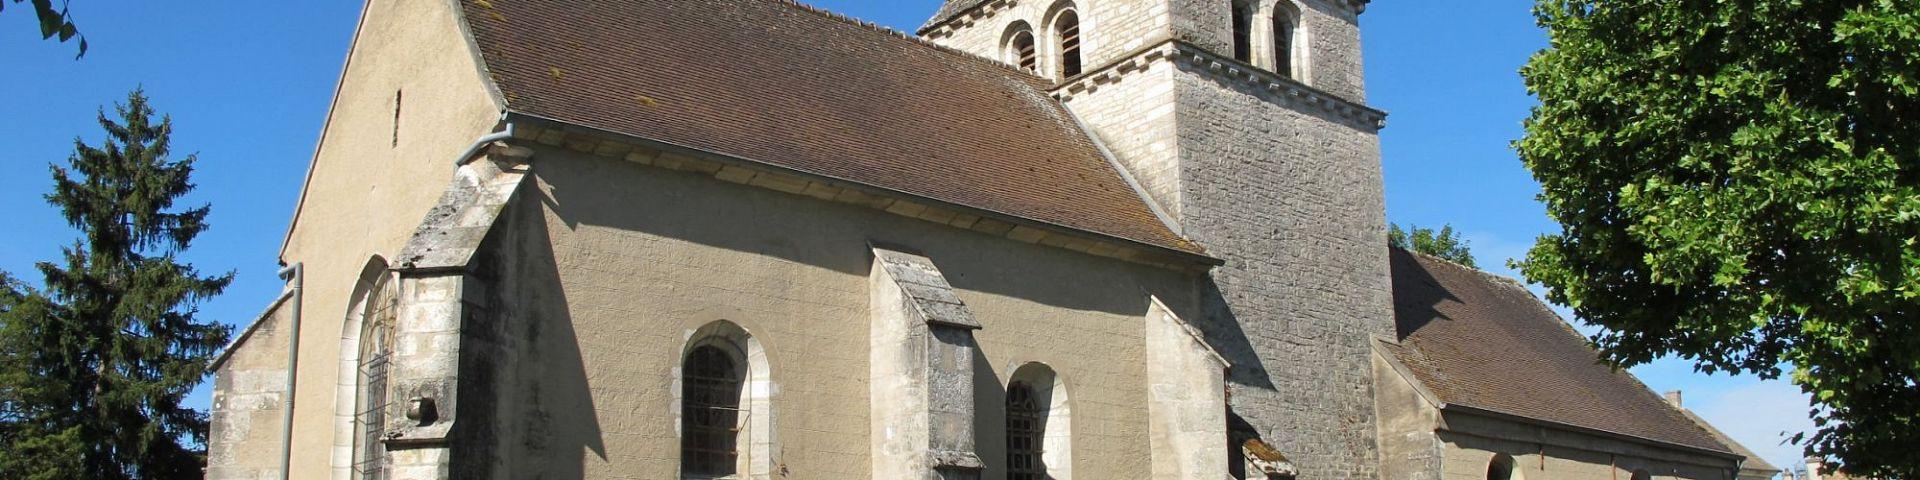 Merceuil - Eglise Saint-Laurent (21)